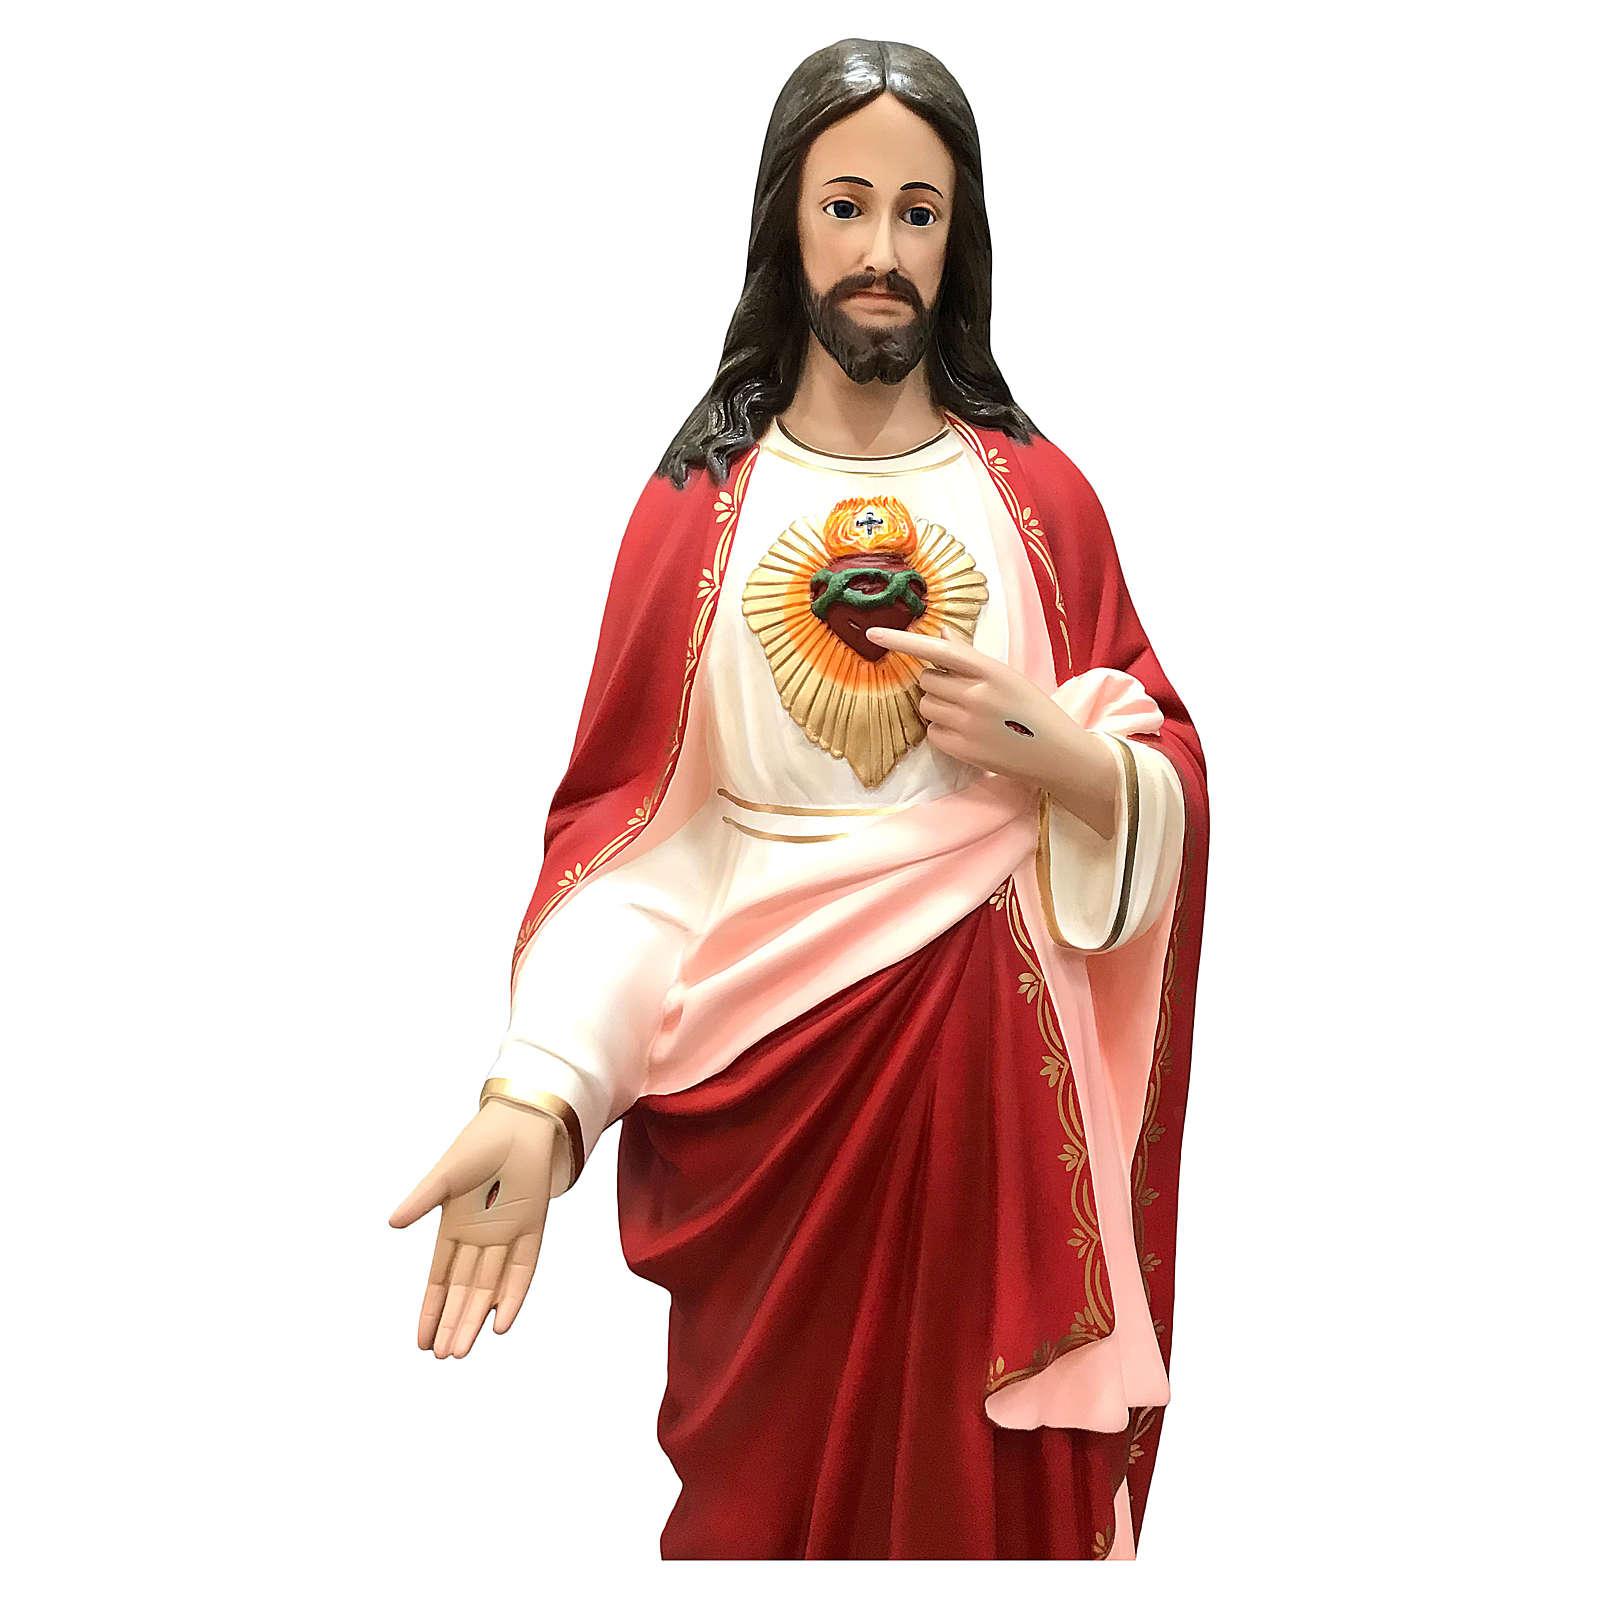 Statua Gesù Sacro Cuore 110 cm vetroresina dipinta occhi vetro 4